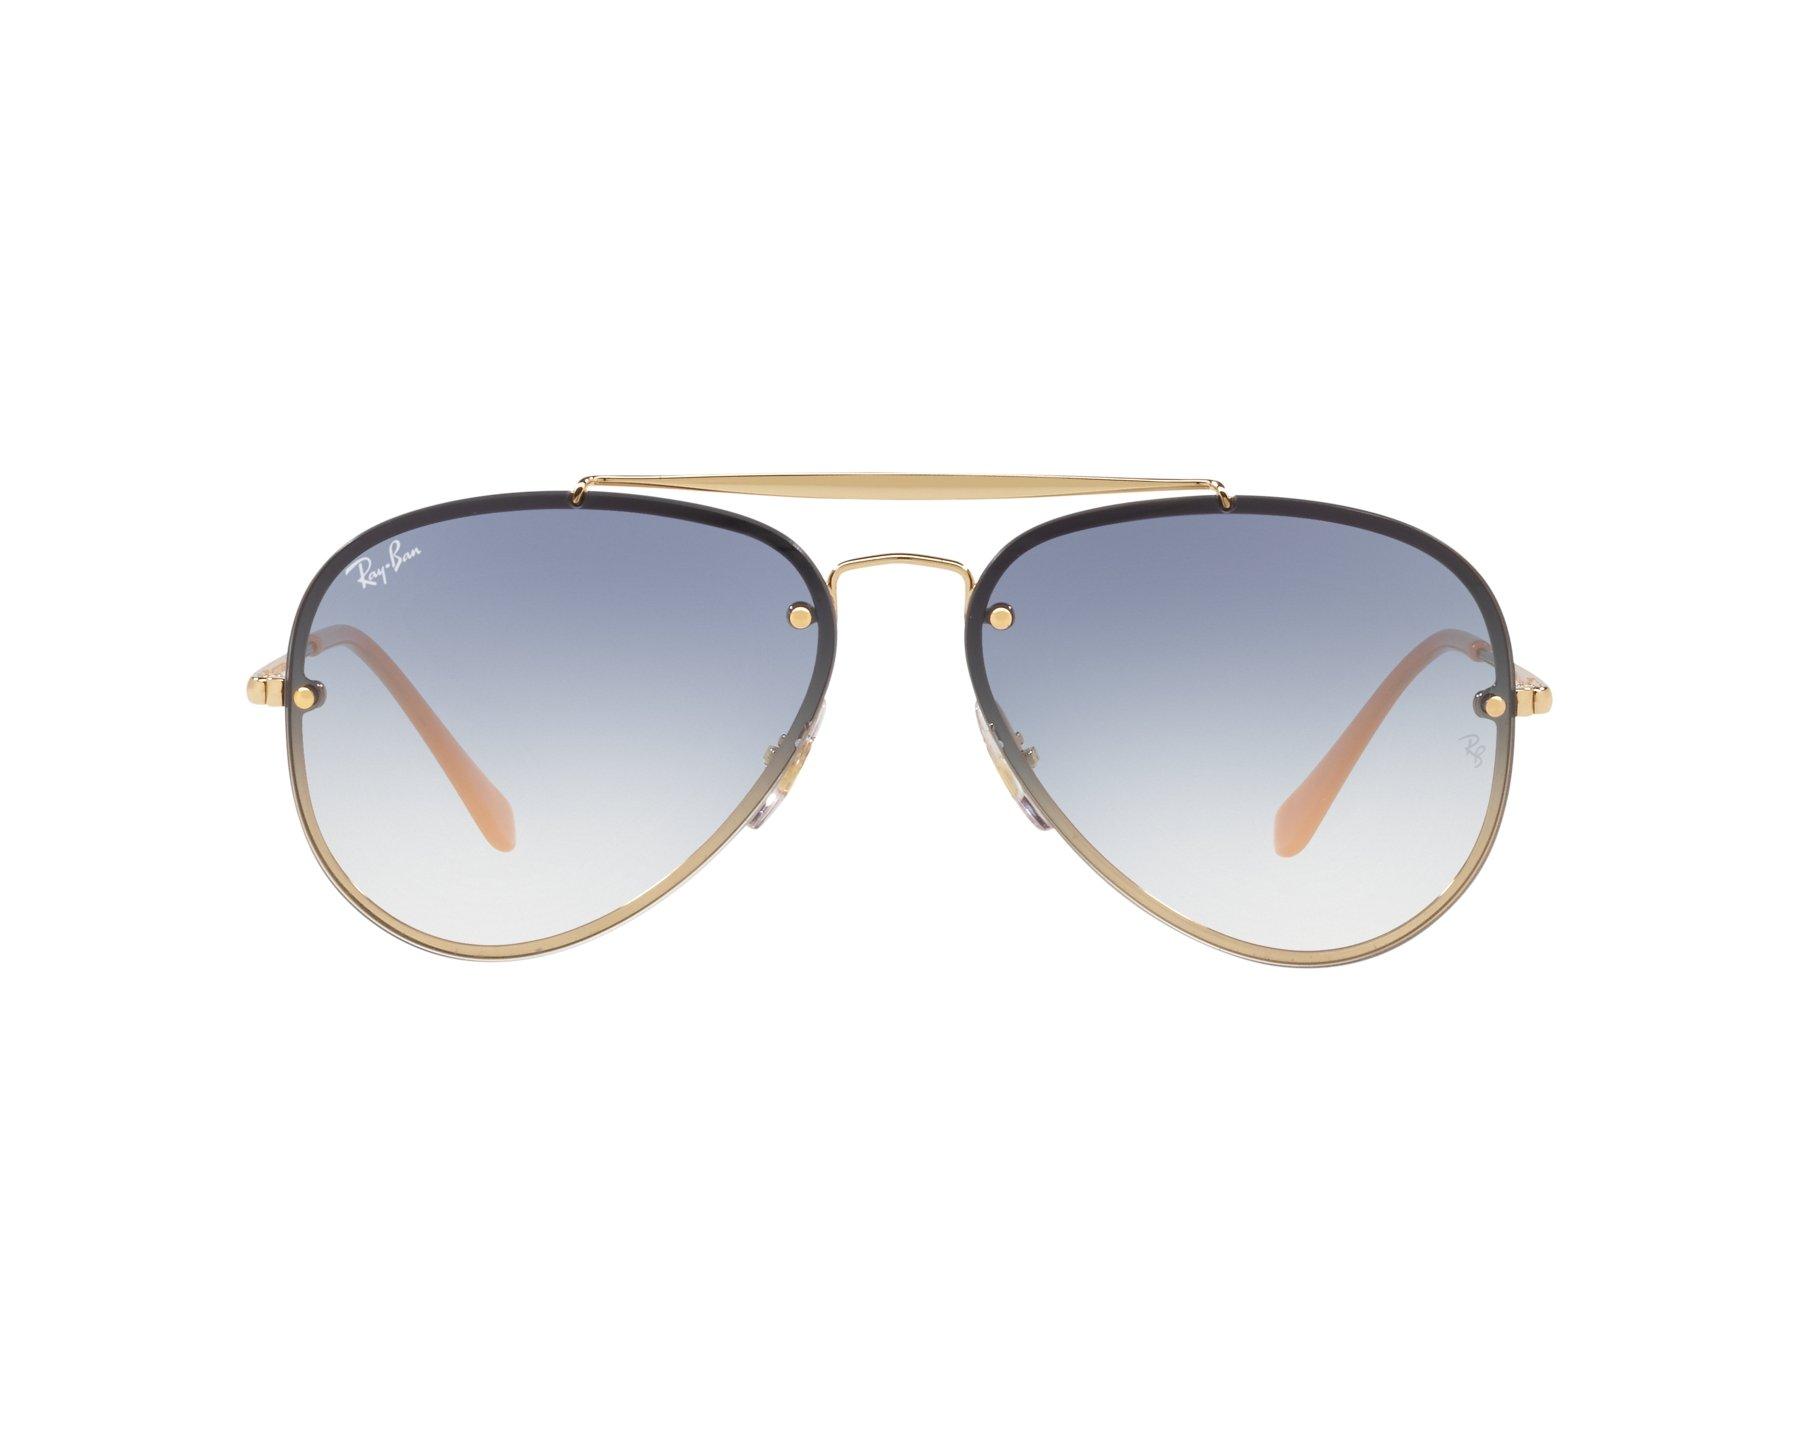 Sunglasses Ray-Ban Blaze Aviator RB-3584-N - 001 19 c2798d1c6b